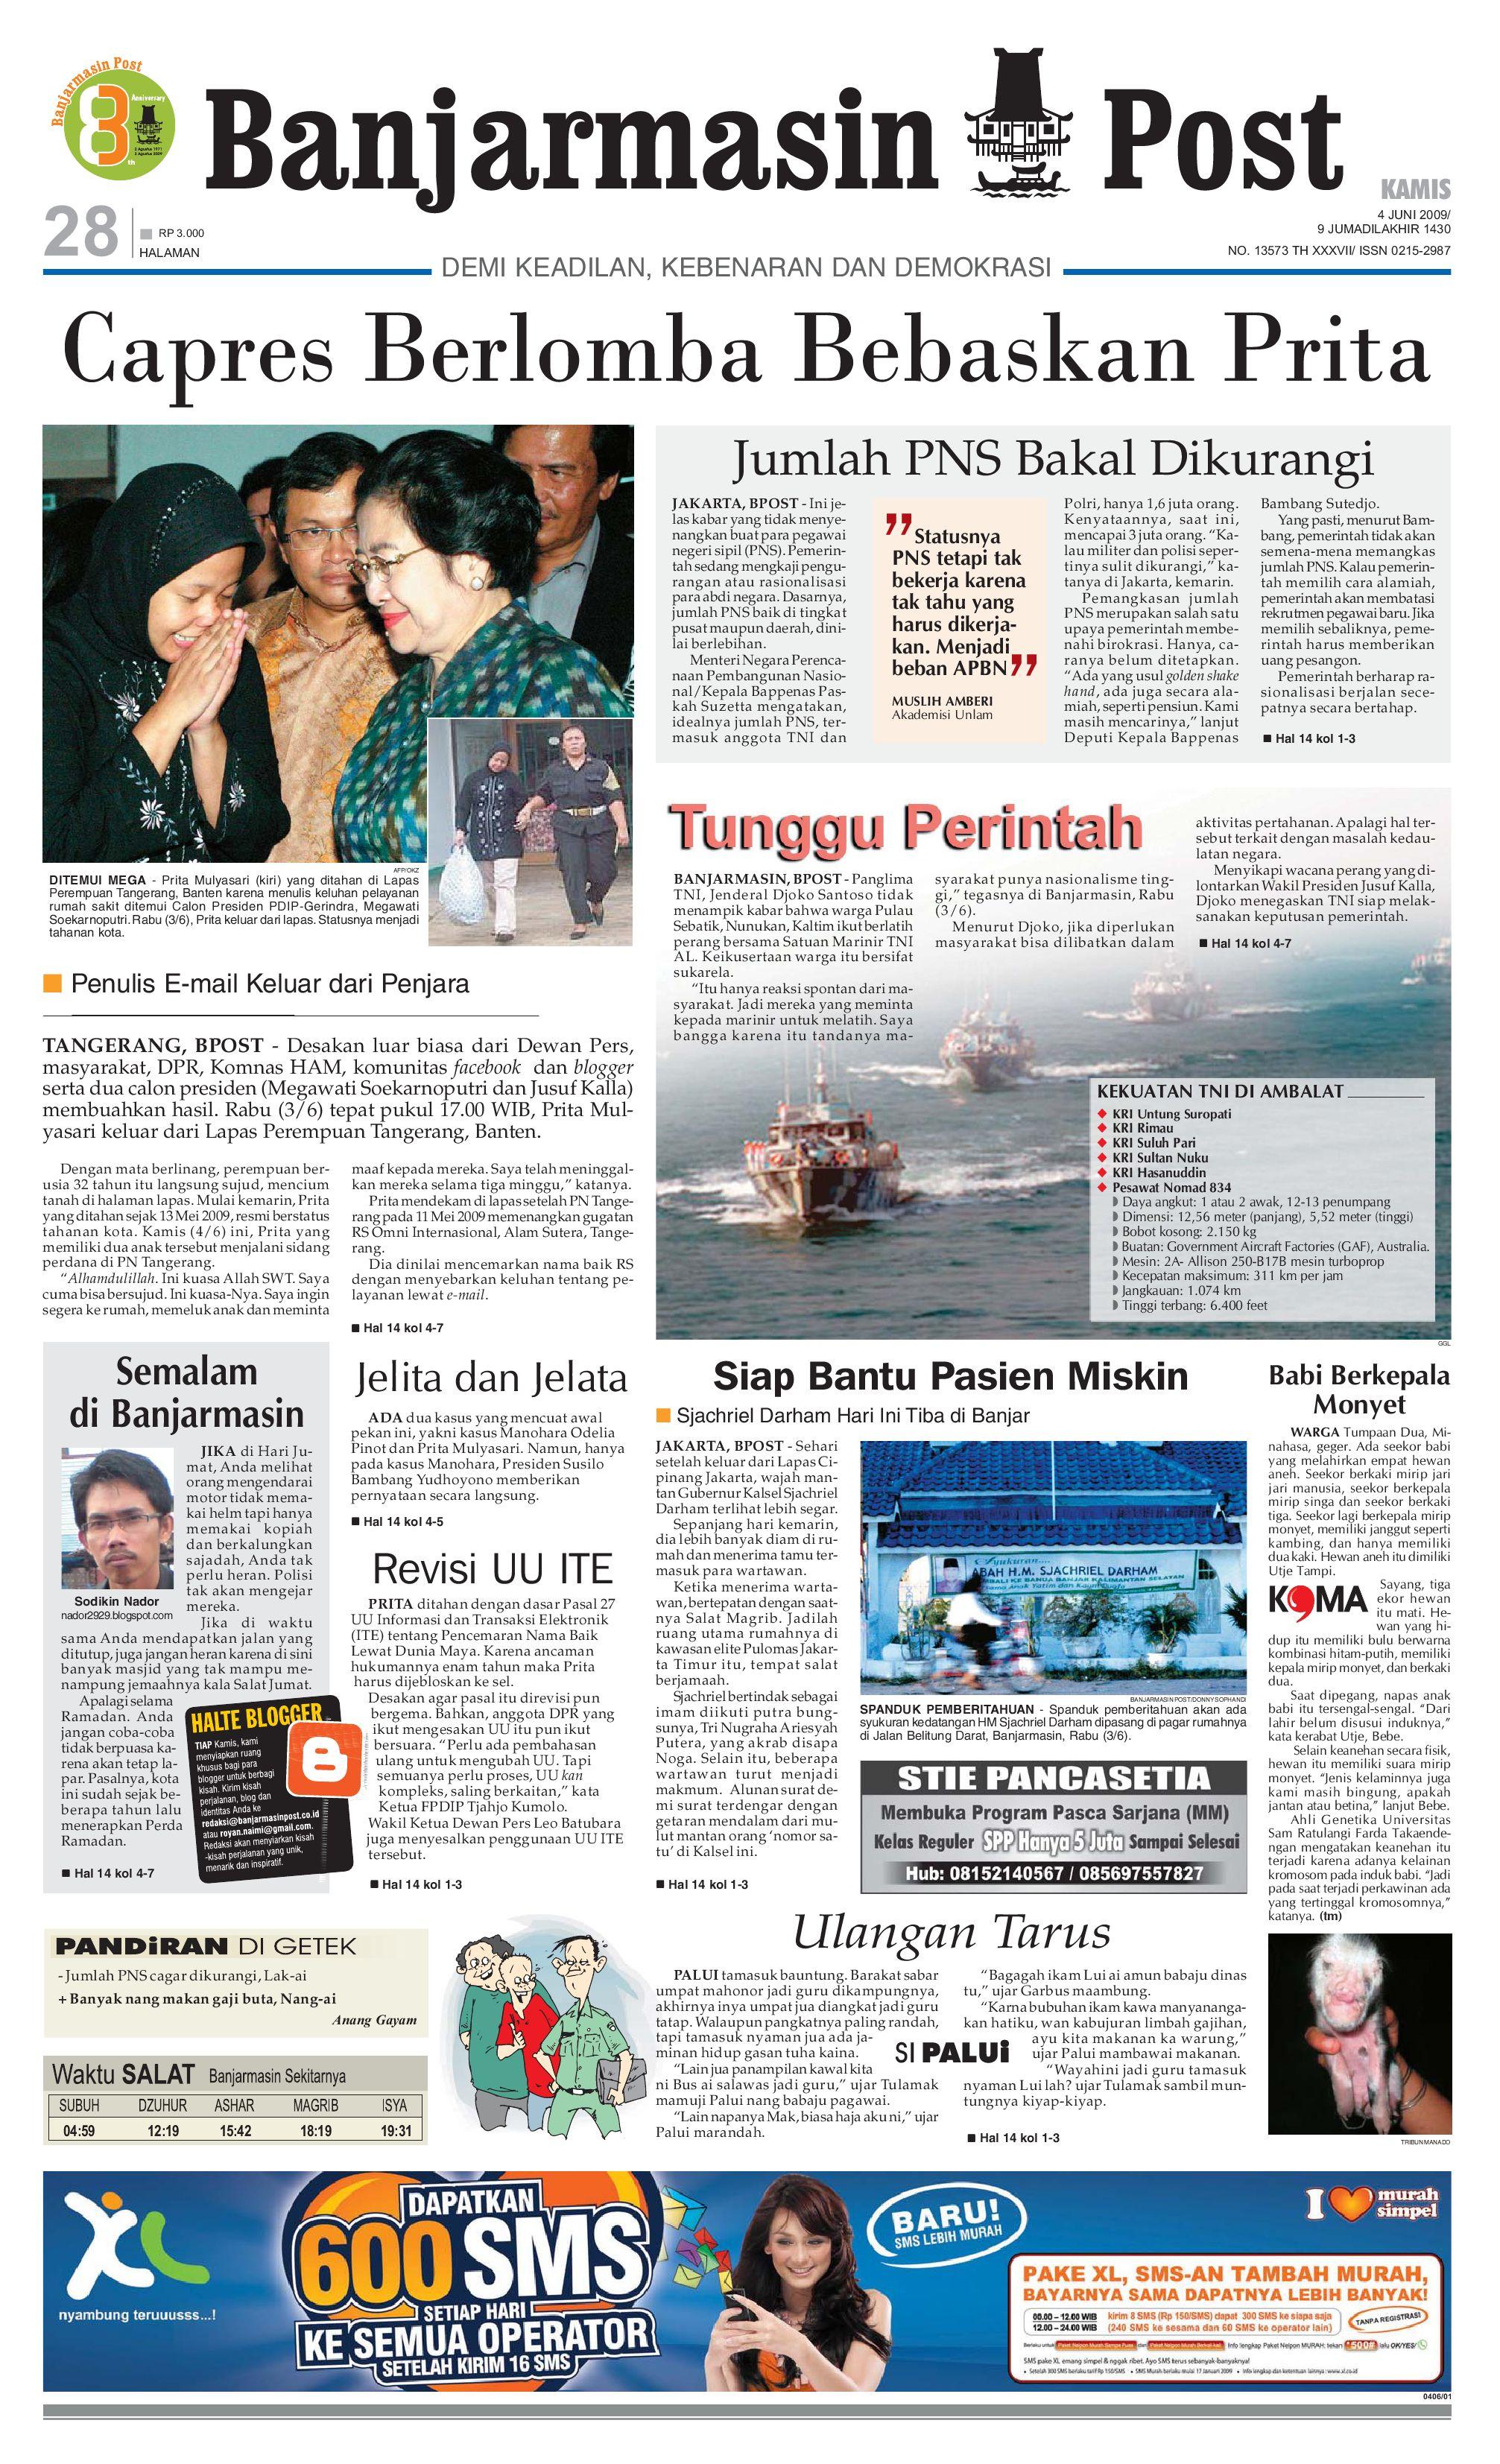 Banjarmasin Post - Edisi Kamis 4 Juni 2009 by Banjarmasin Post - issuu 2709f5a363